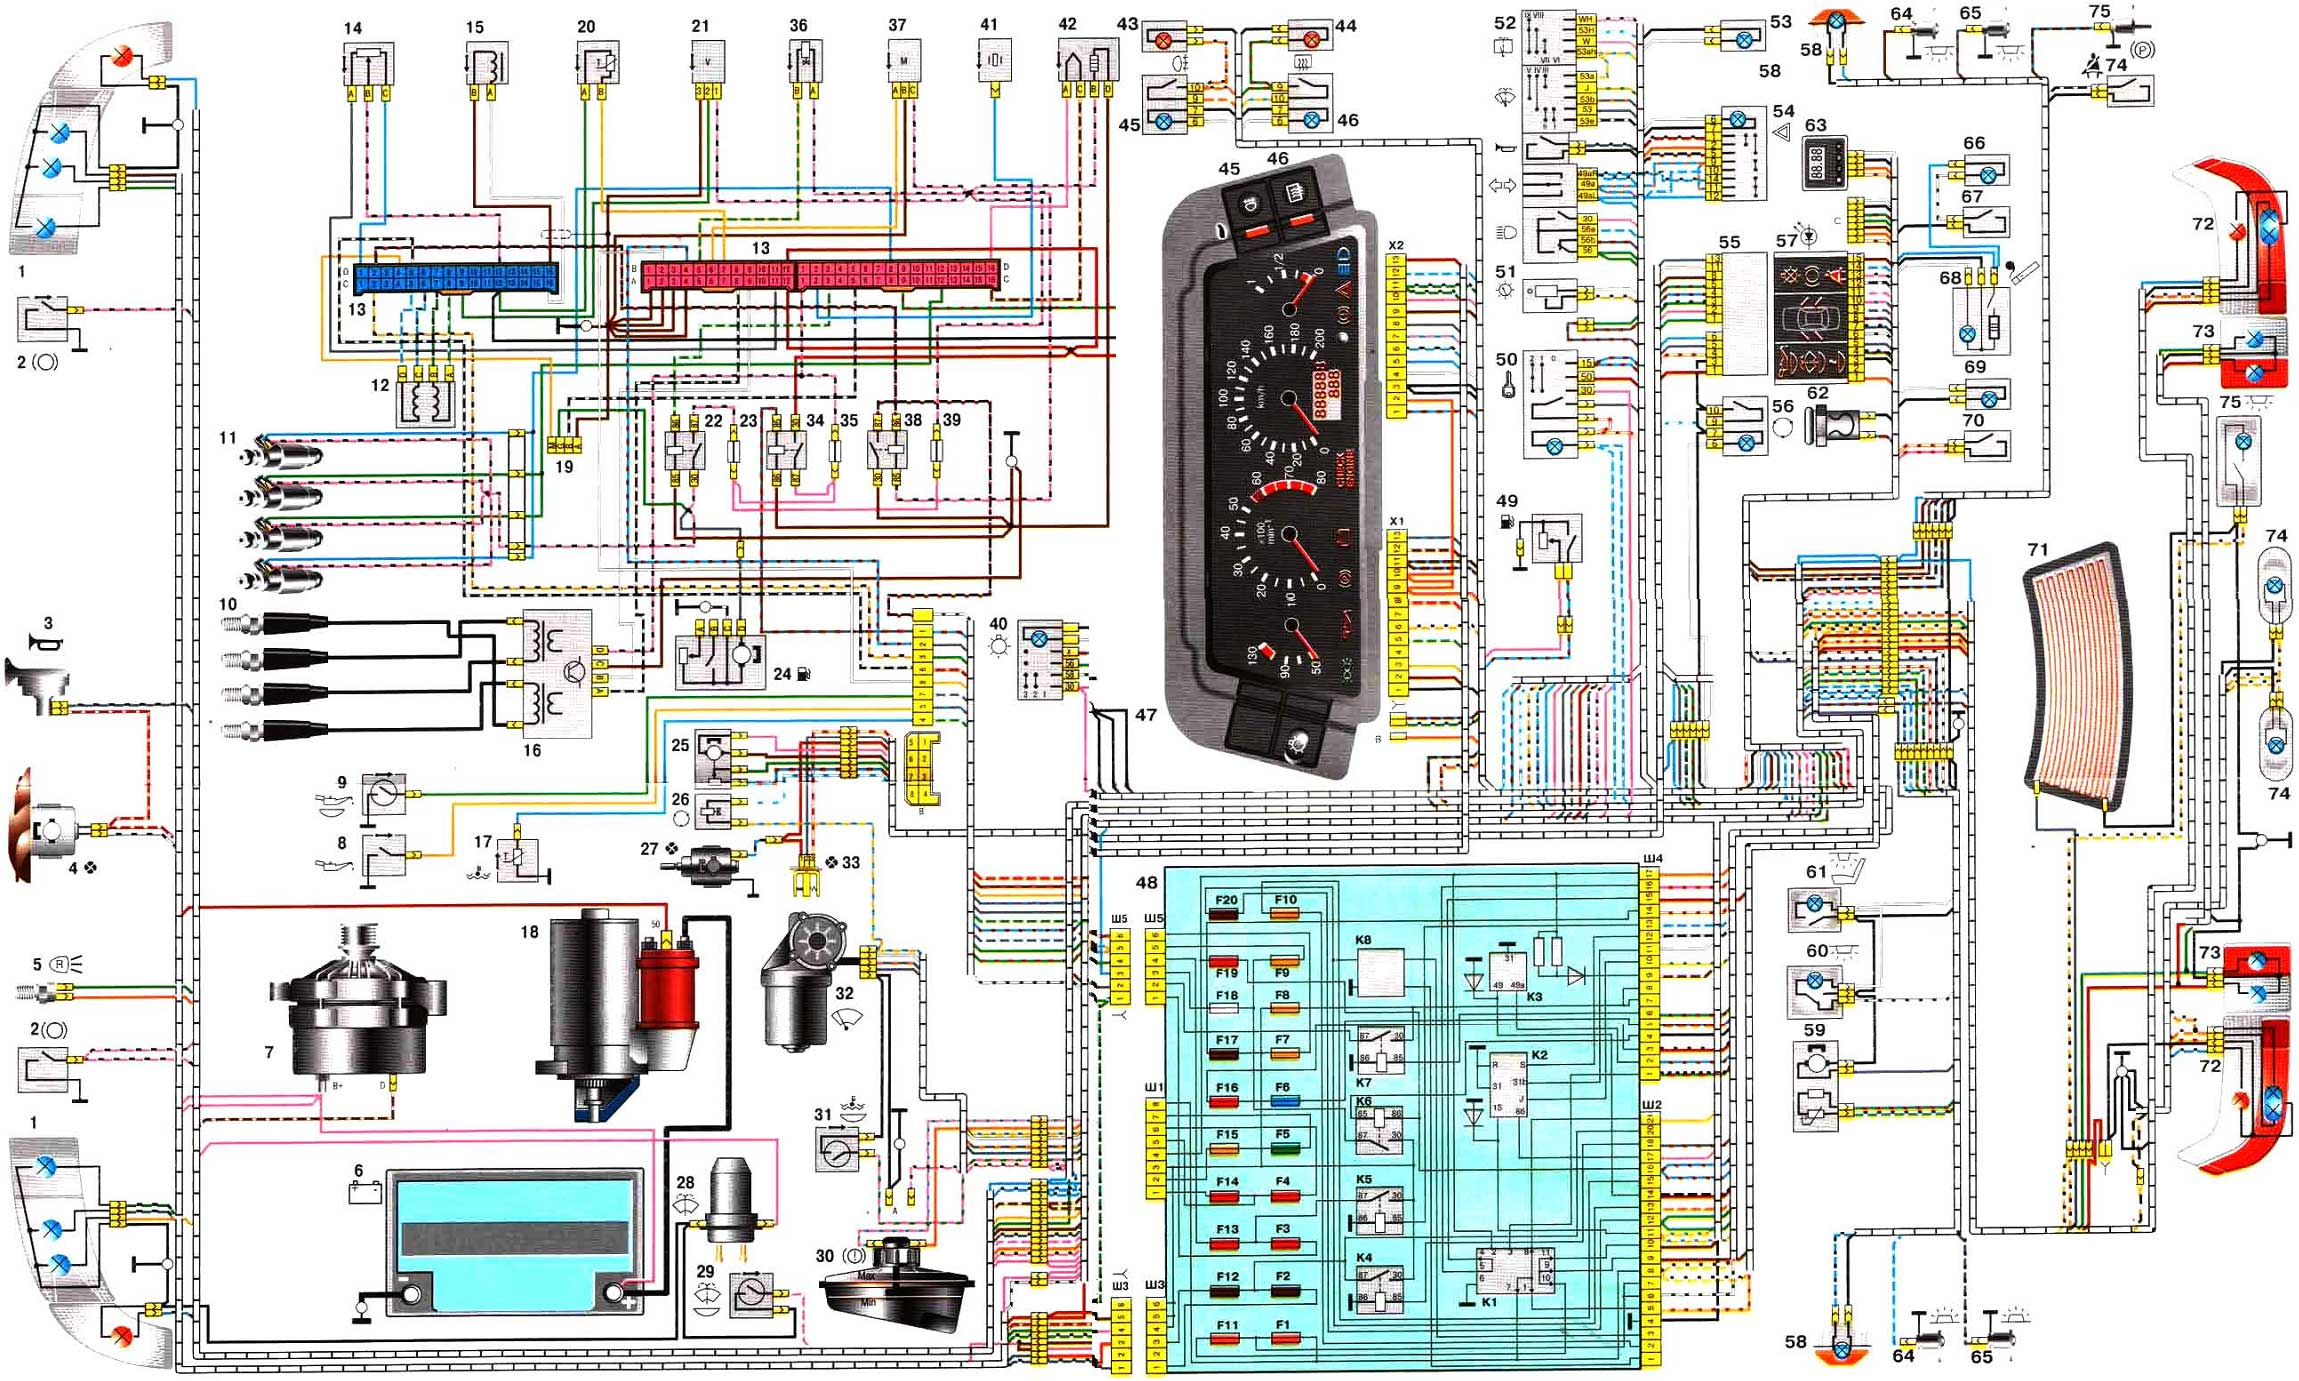 Фото №19 - схема датчика заднего хода ВАЗ 2110